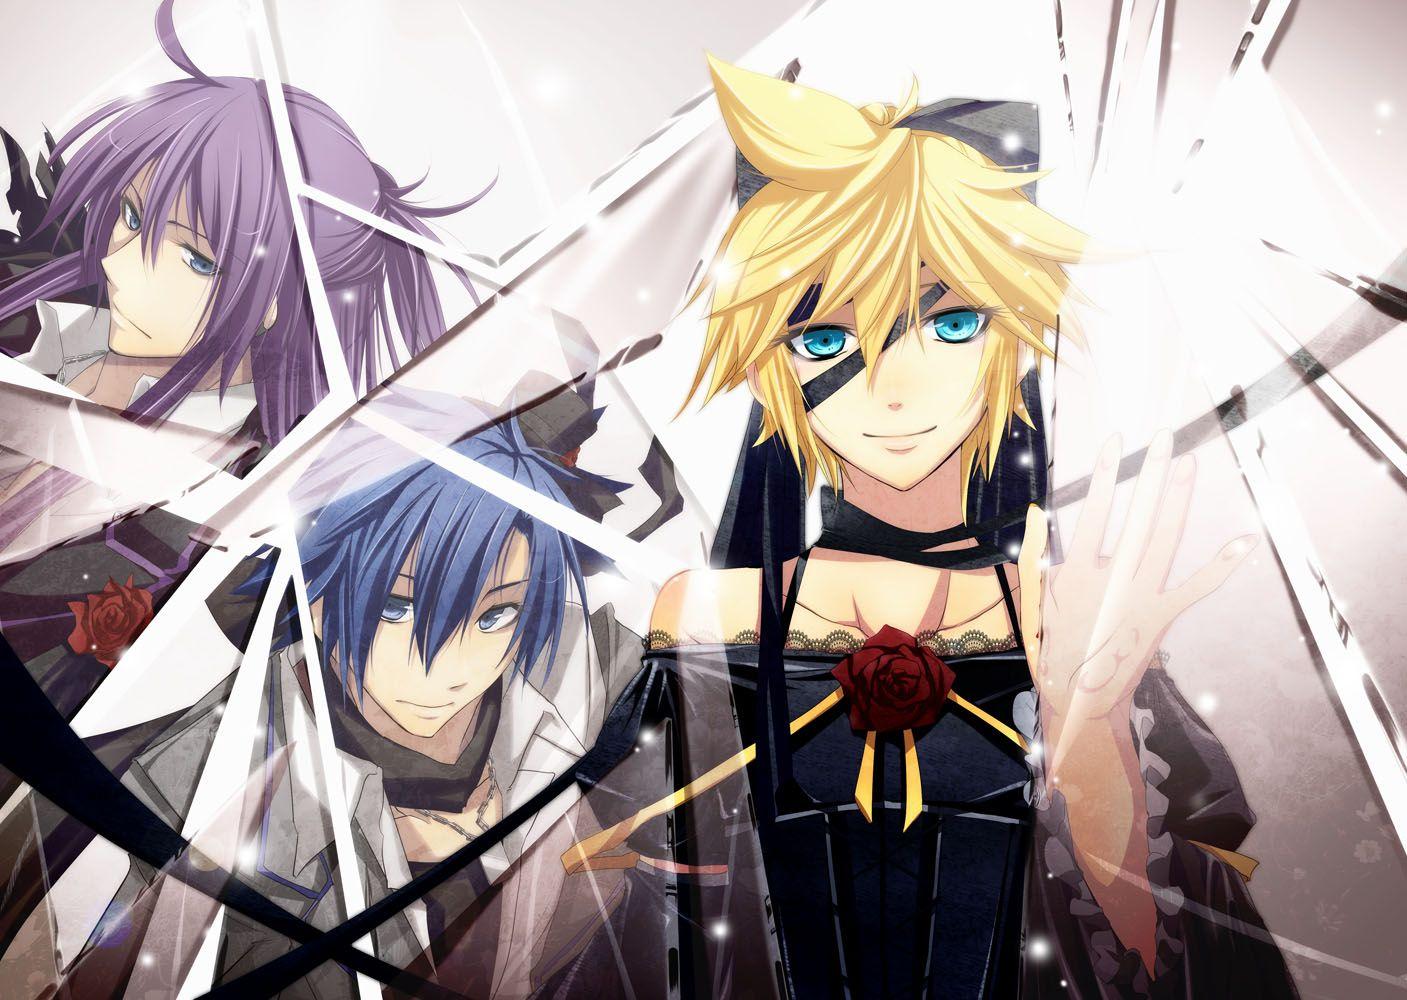 Vocaloid - Imitation Black - Kamui Gakupo, KAITO, Kagamine ... Kaito X Len X Gakupo